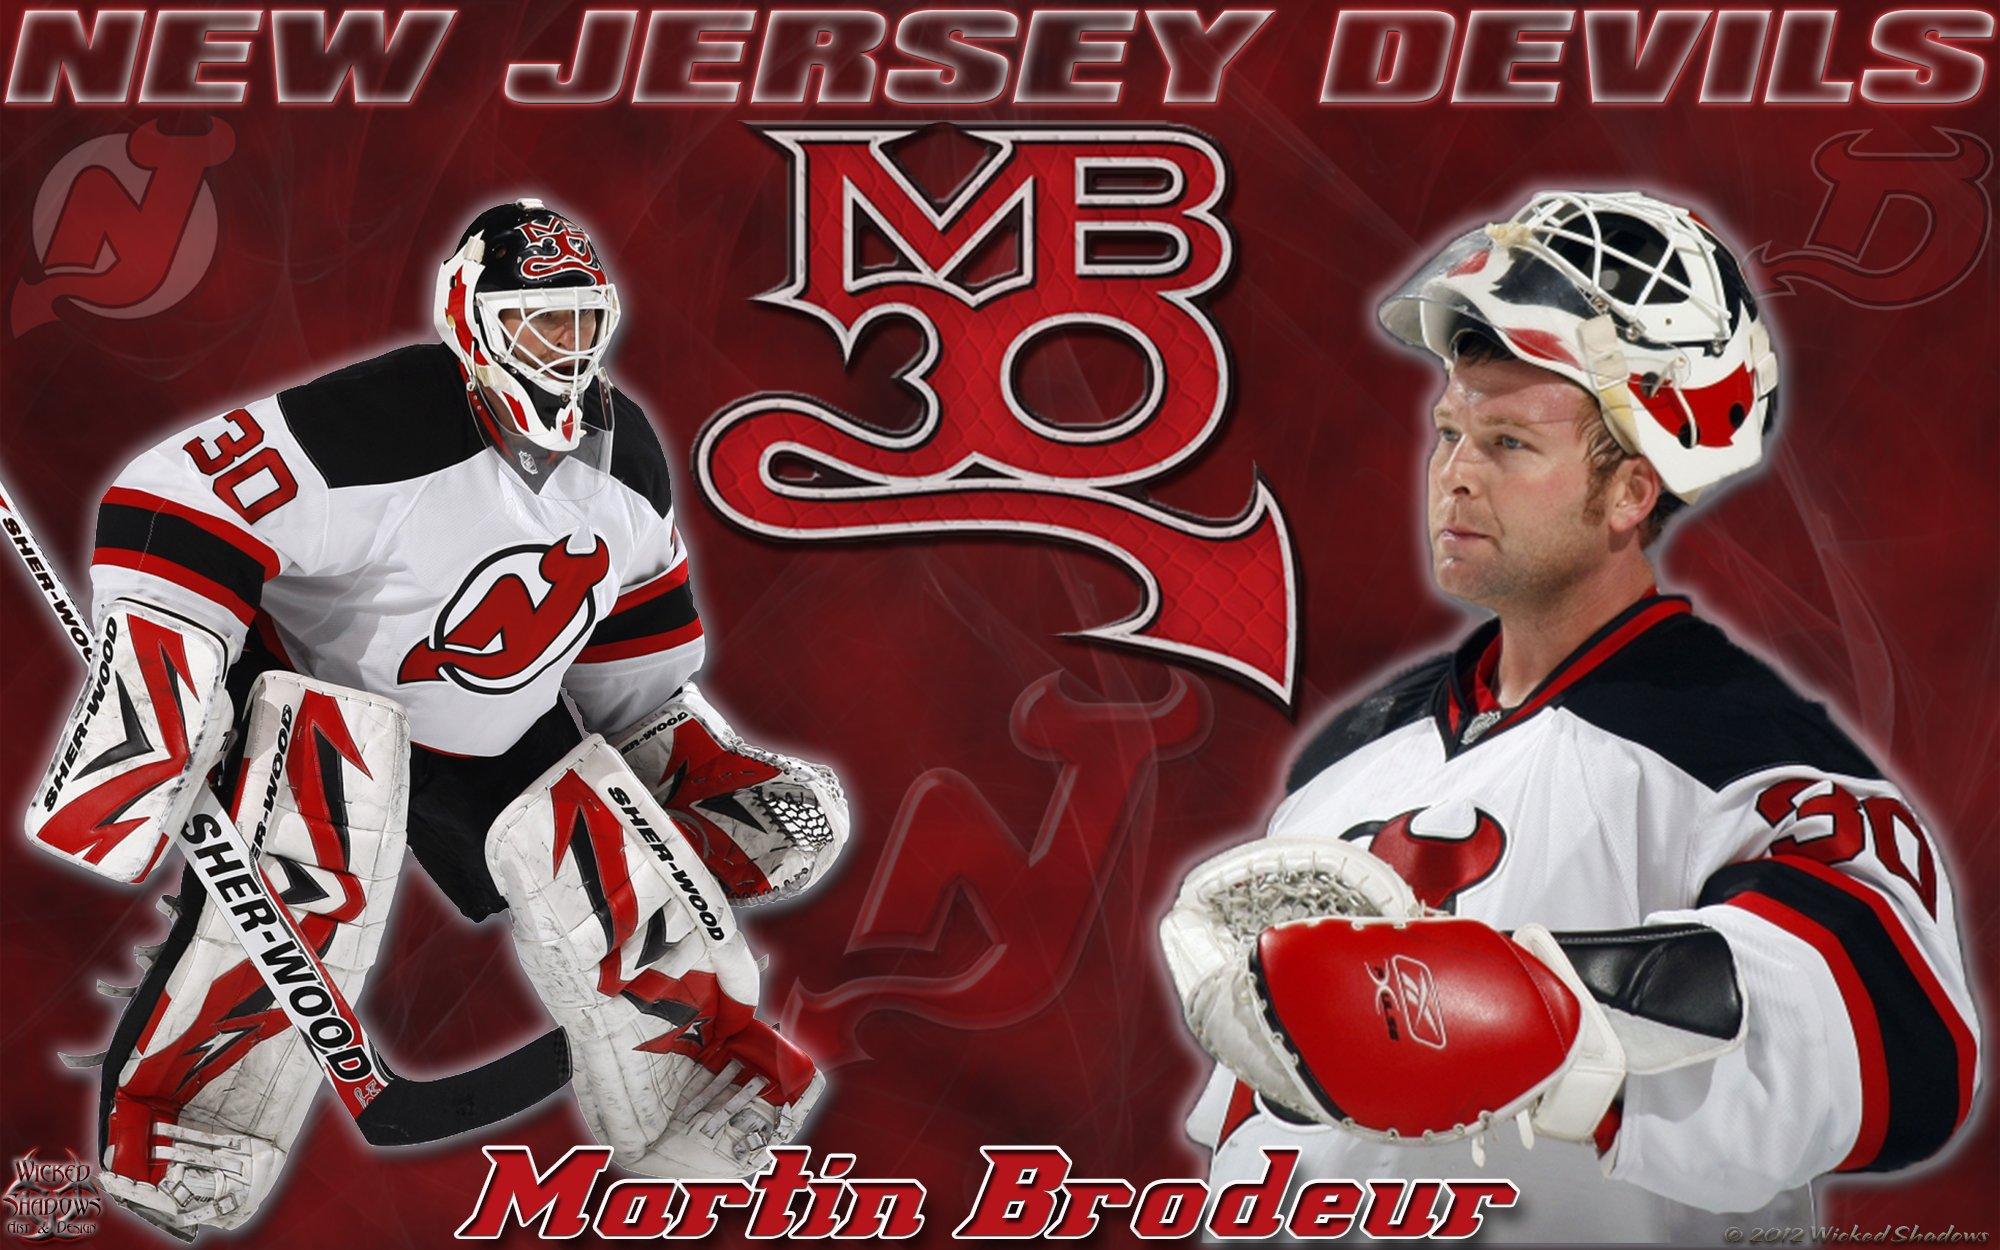 Wallpaper 2000x1250 Px 30 Devils Hockey Jersey New Nhl